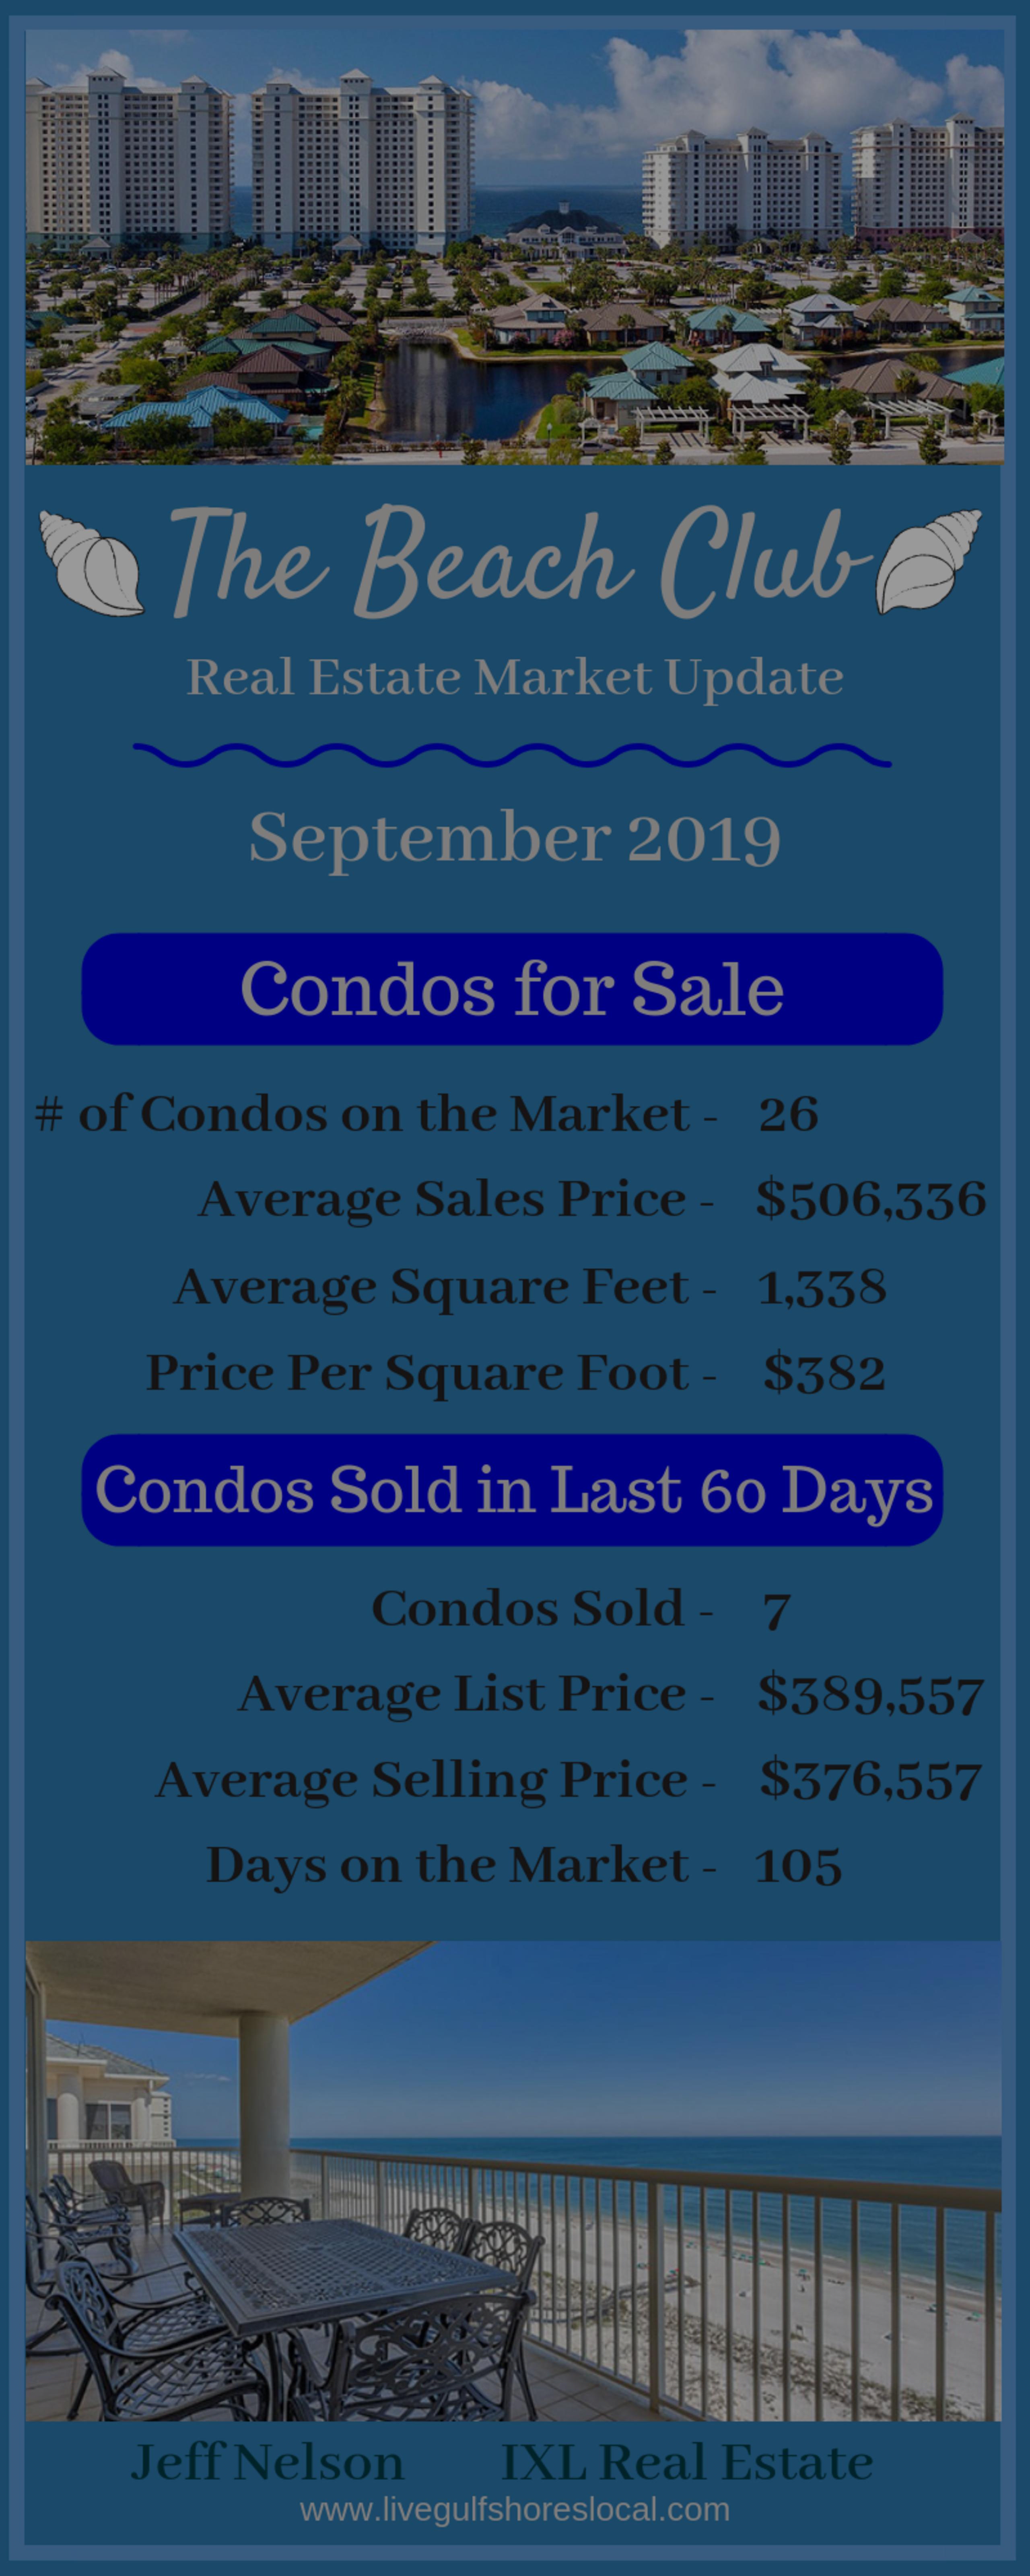 The Beach Club Real Estate Market Update – Sept 2019